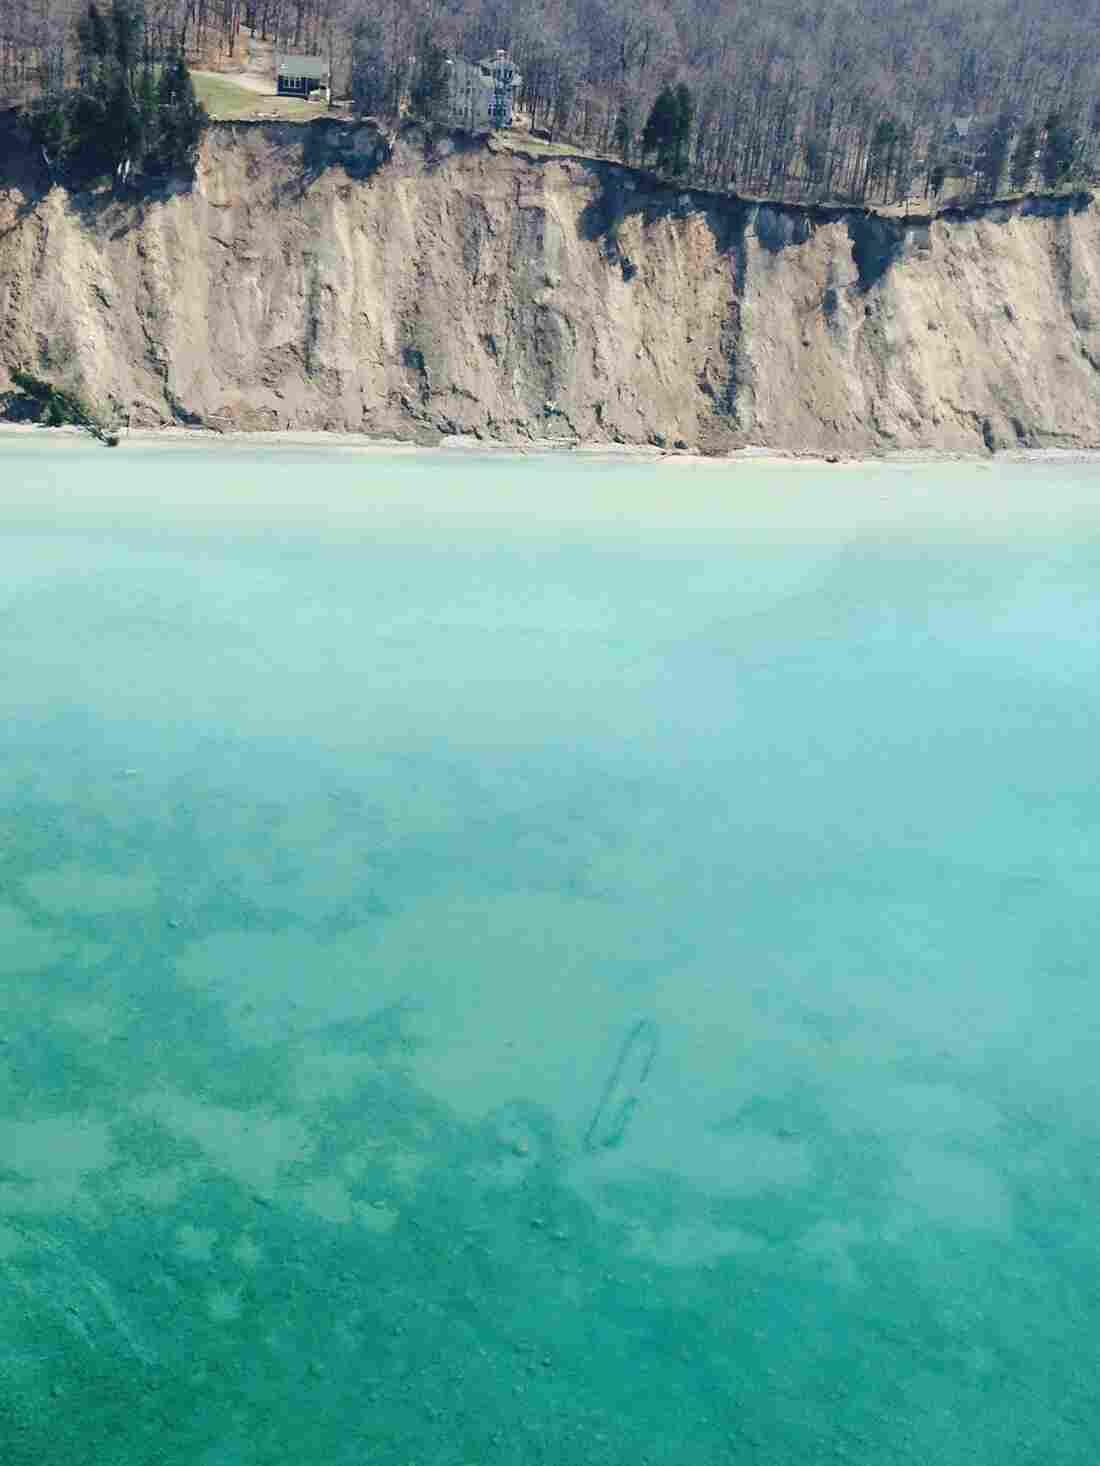 Shipwrecks Ahoy Coast Guard Shares Pics From Crystal